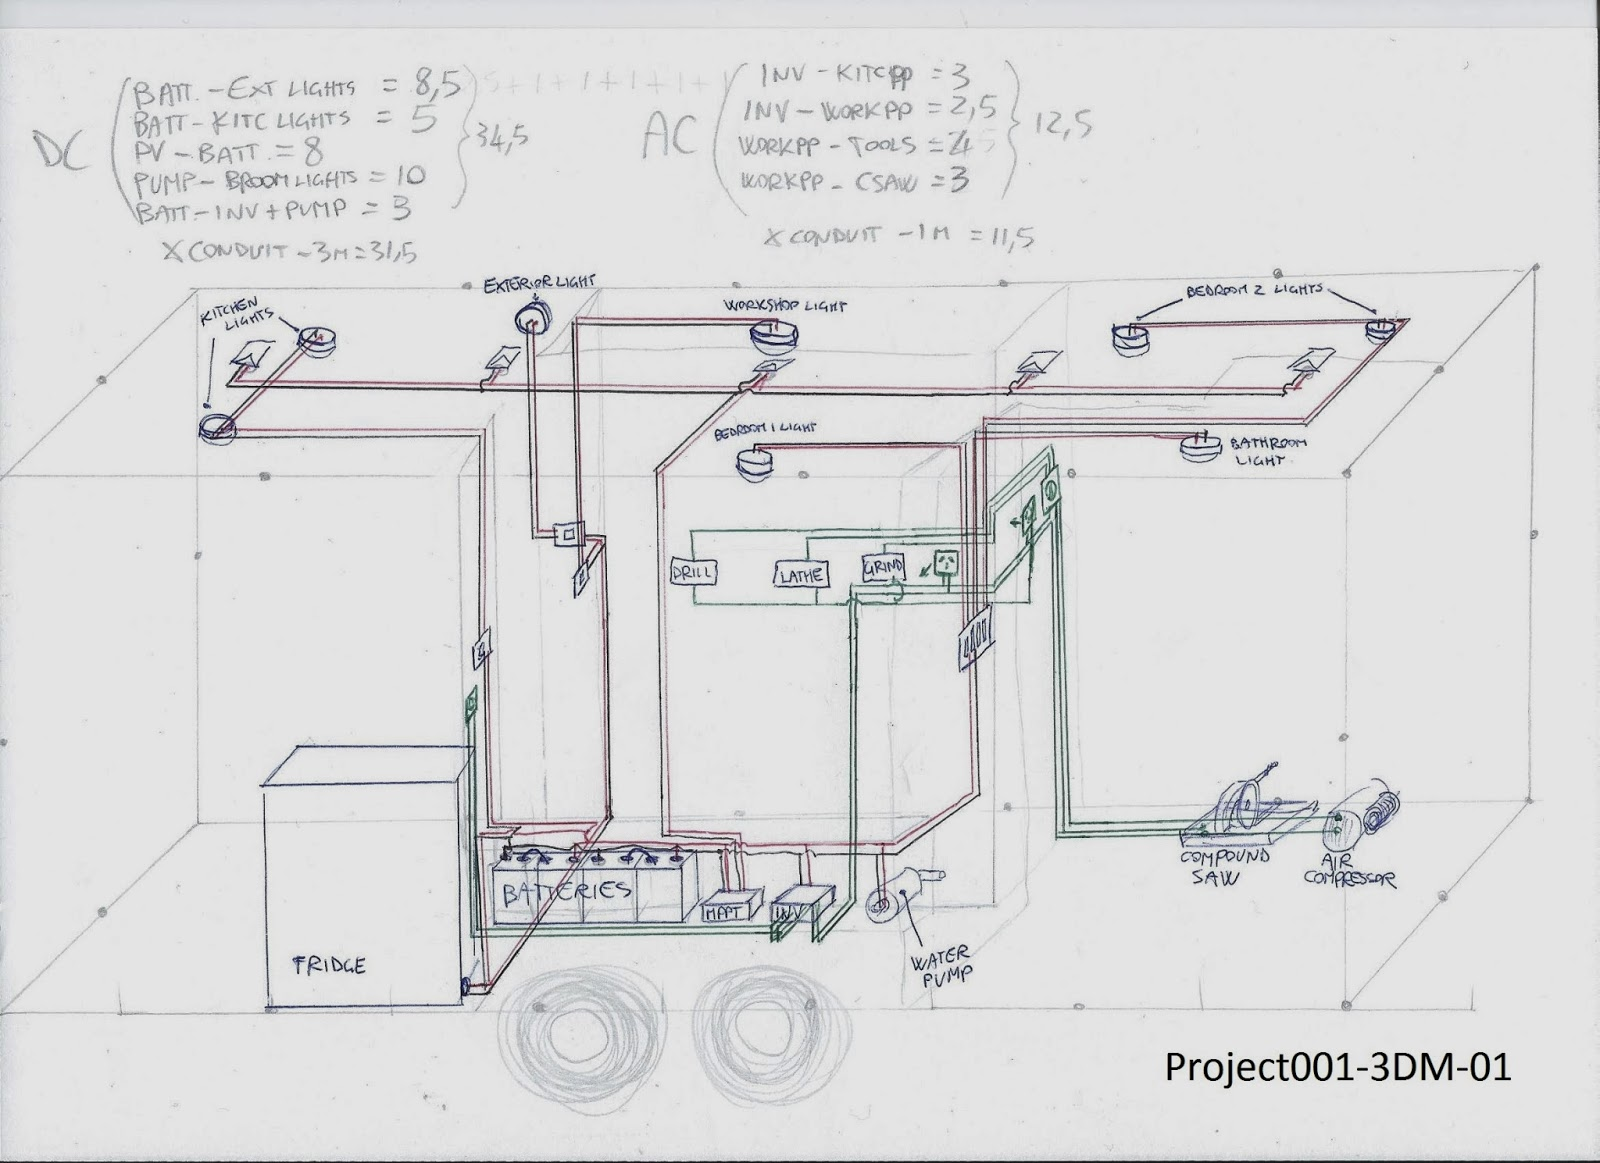 Wiring Diagram Wiring Diagram Or Schematic On Ke